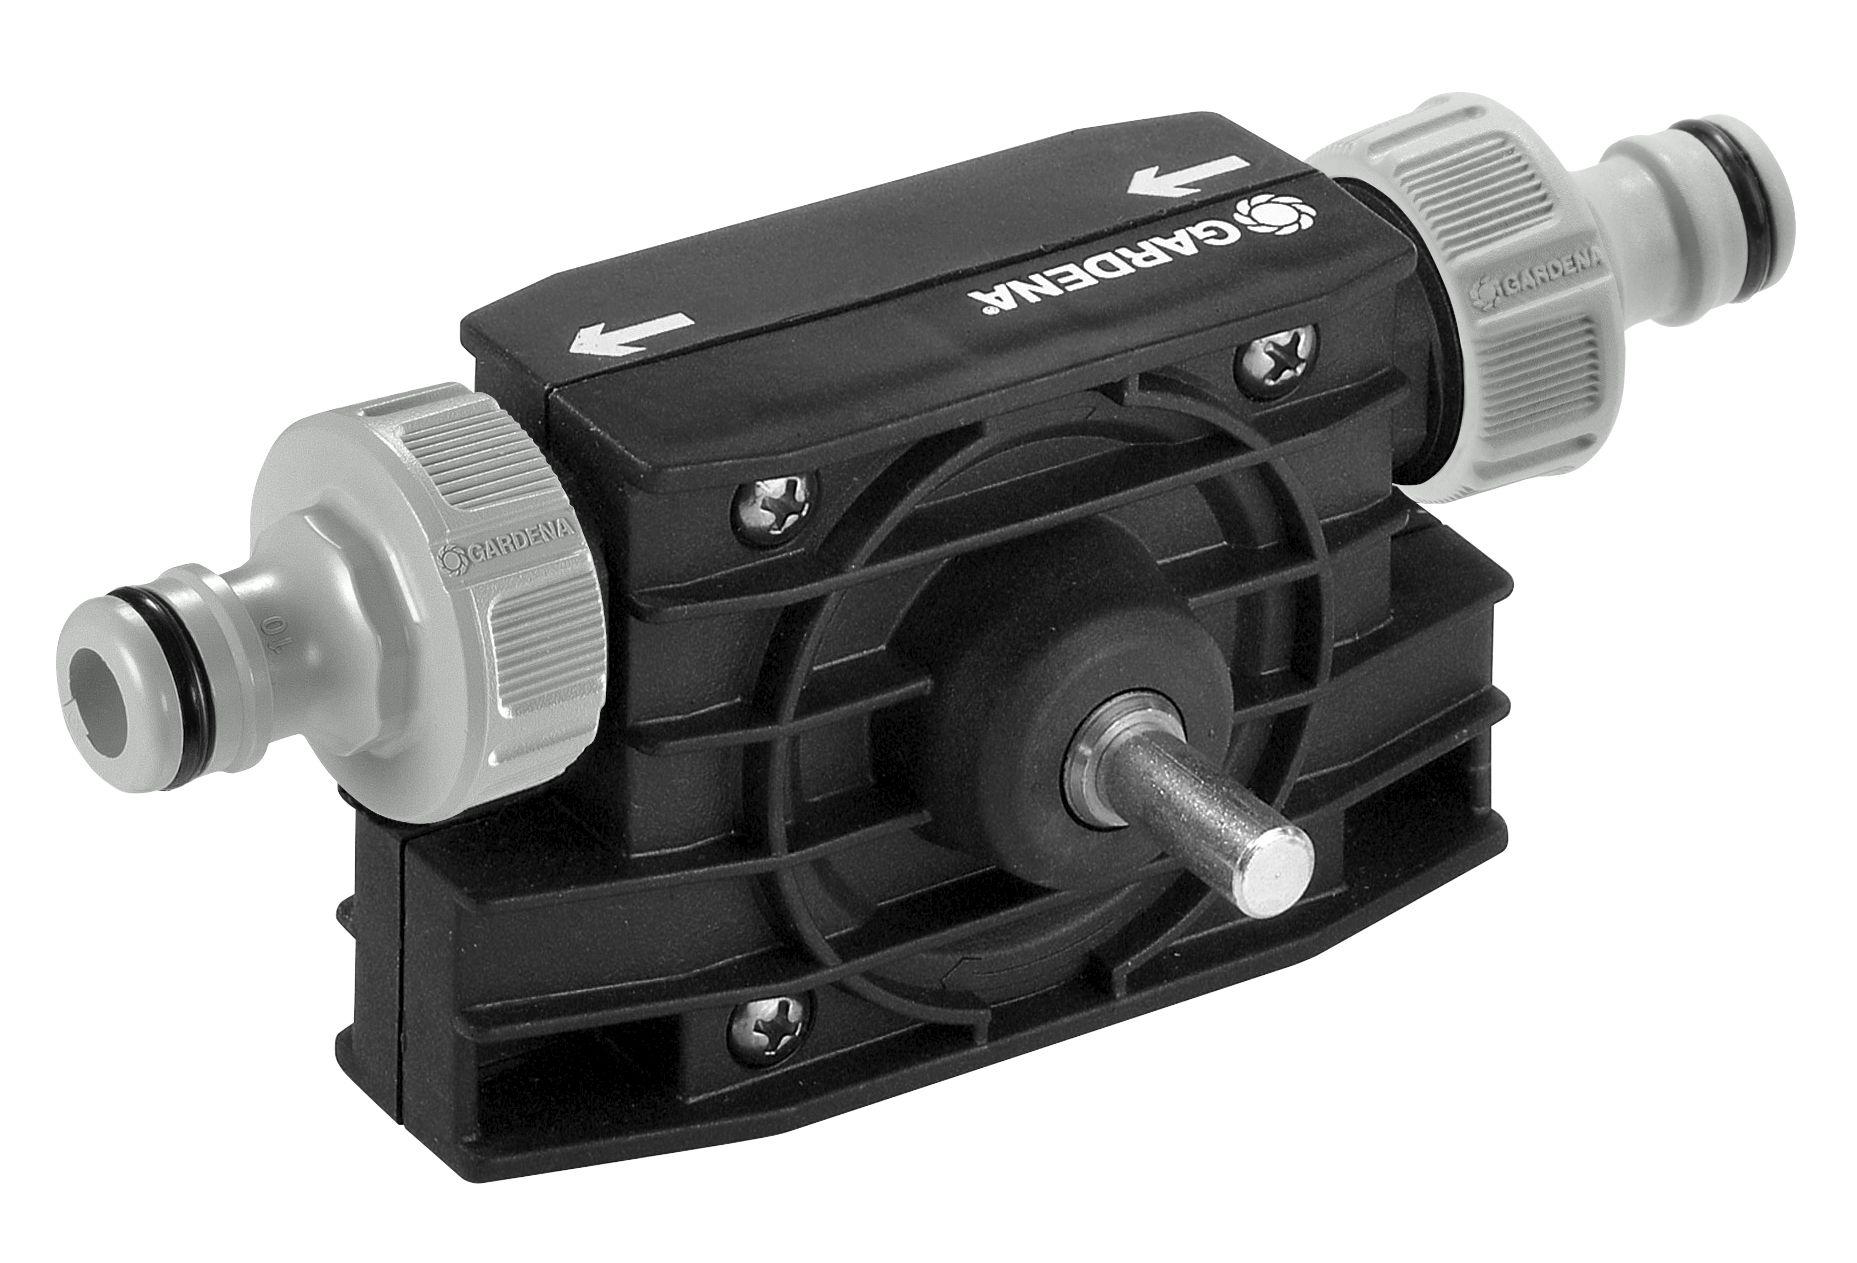 GD-0231 (1490-20 Gardena Electric Drill Pump)